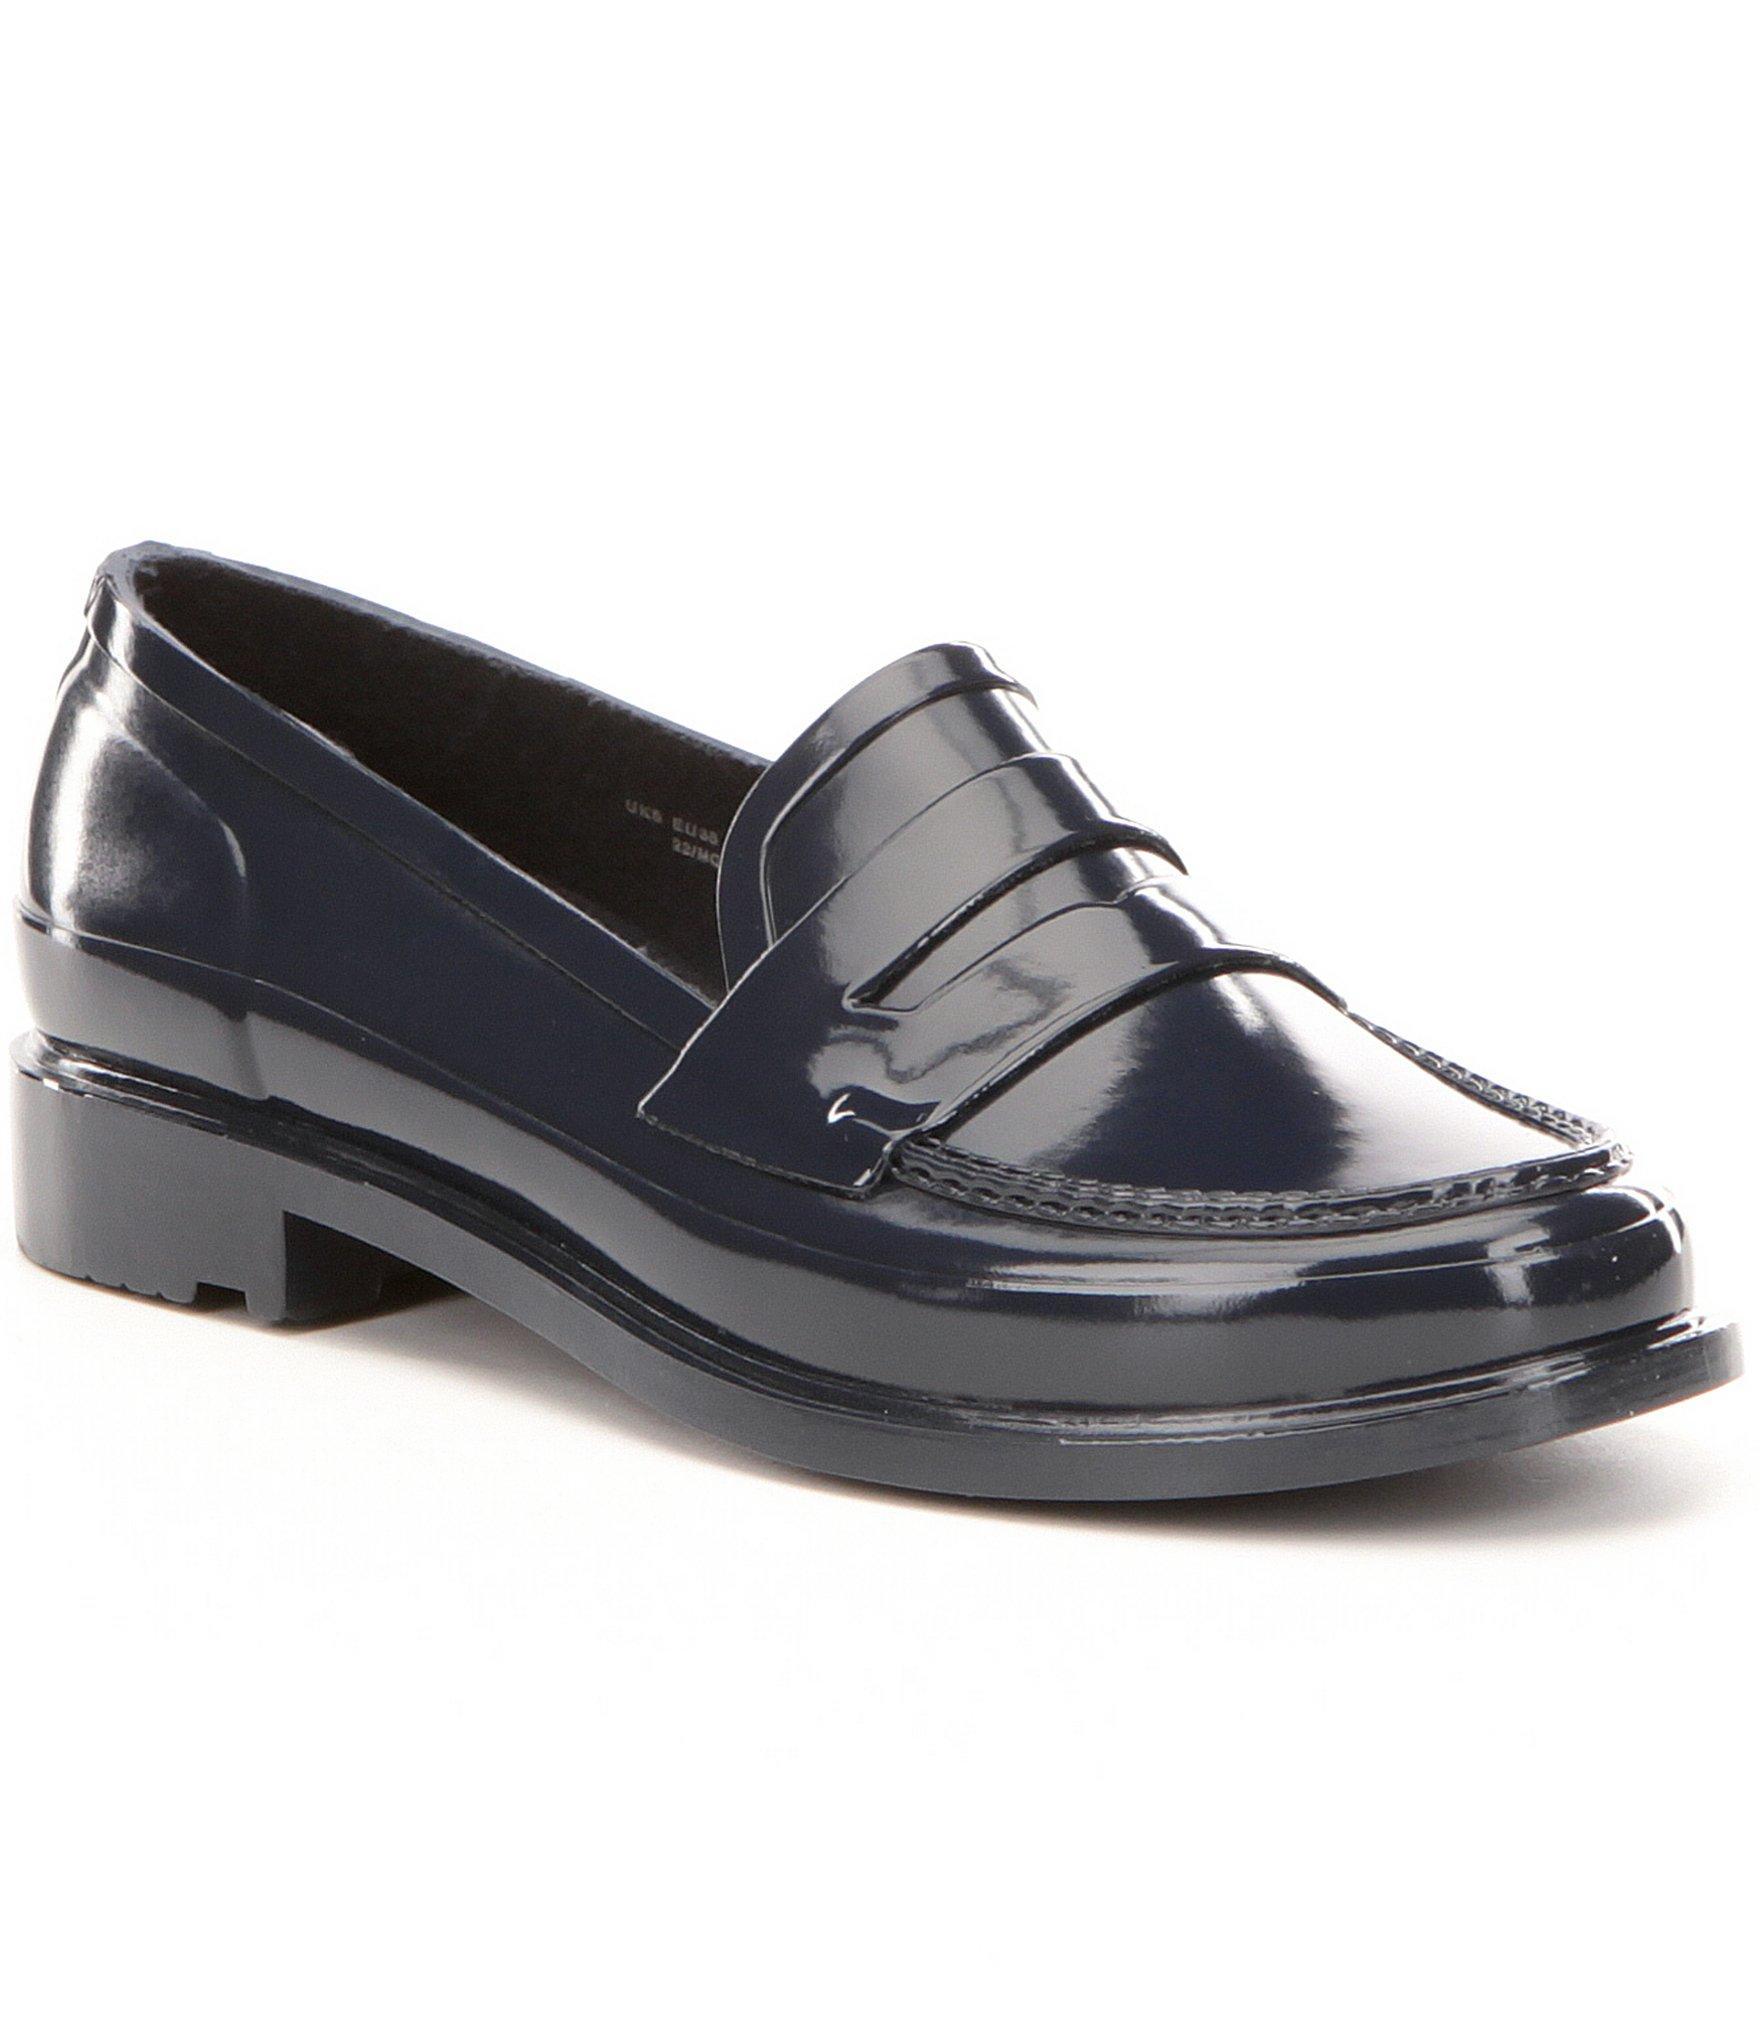 a7d7518fe28 Lyst - HUNTER Original Short Waterproof Penny Loafers in Blue for Men